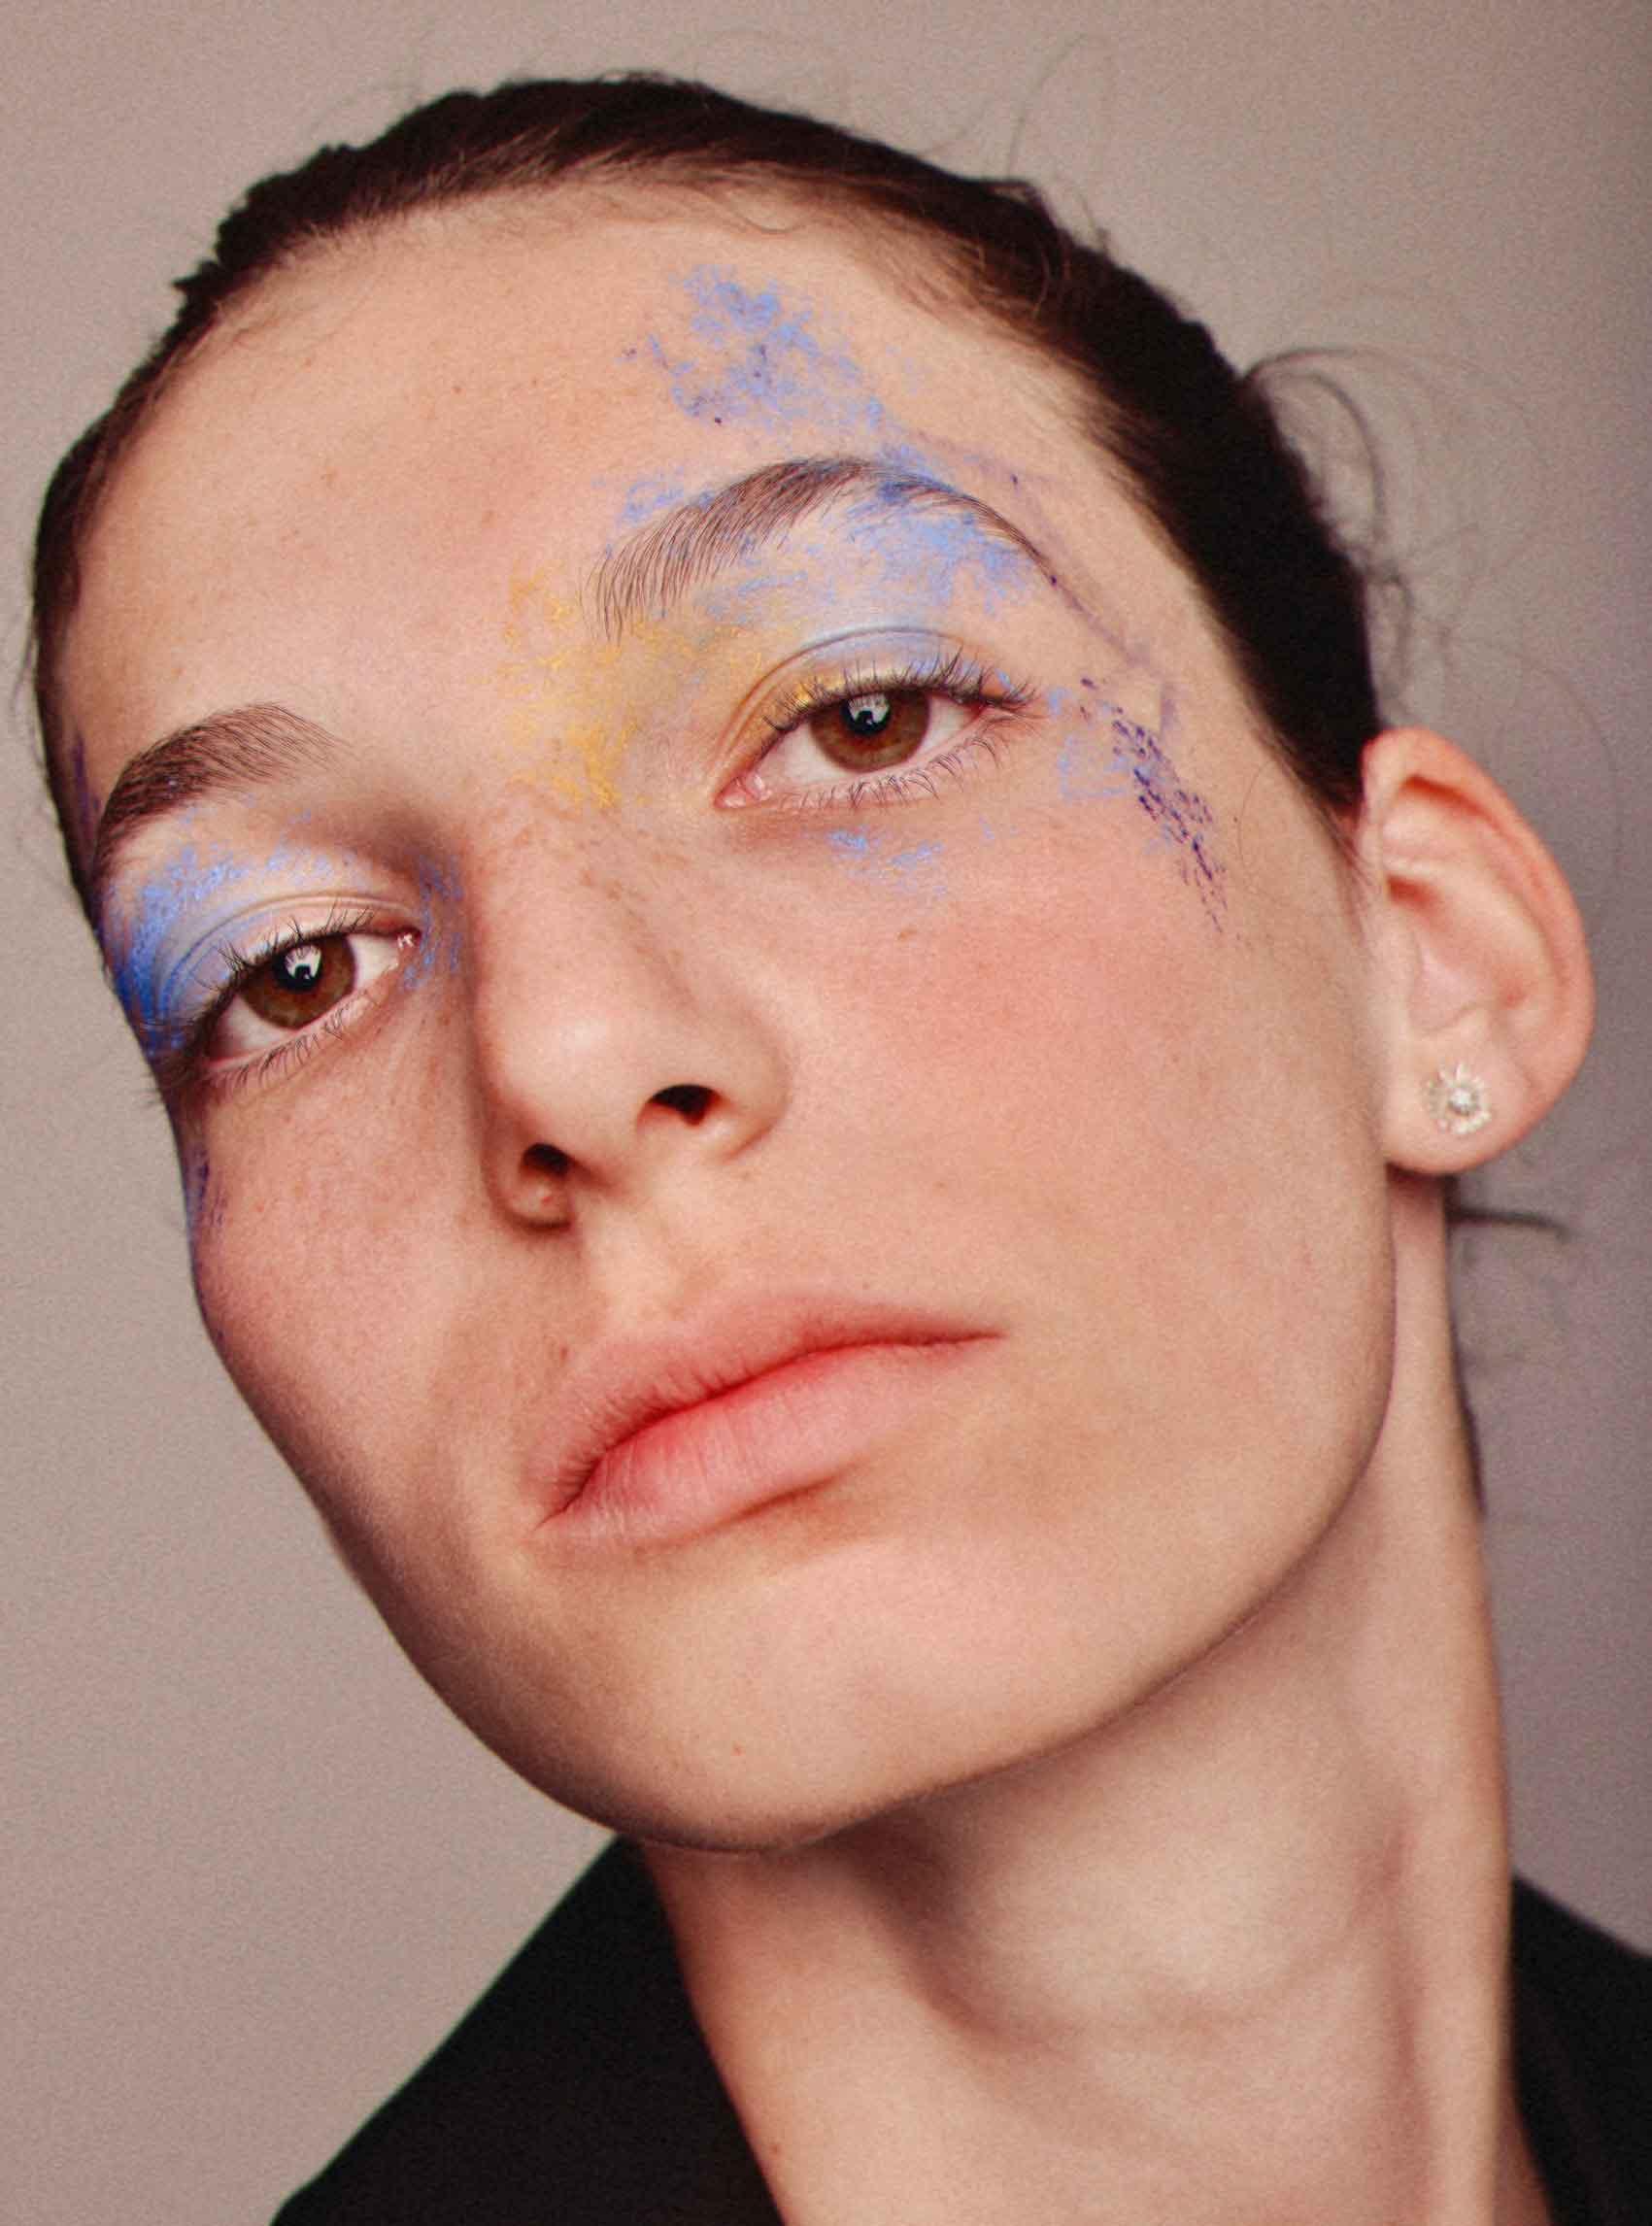 Photographer- Oz Shemesh, Styling - Maor Rabin, Hair - Maor kidushim Agency - yuligroup - Fashion Israel - מגזין אופנה ישראלי-15